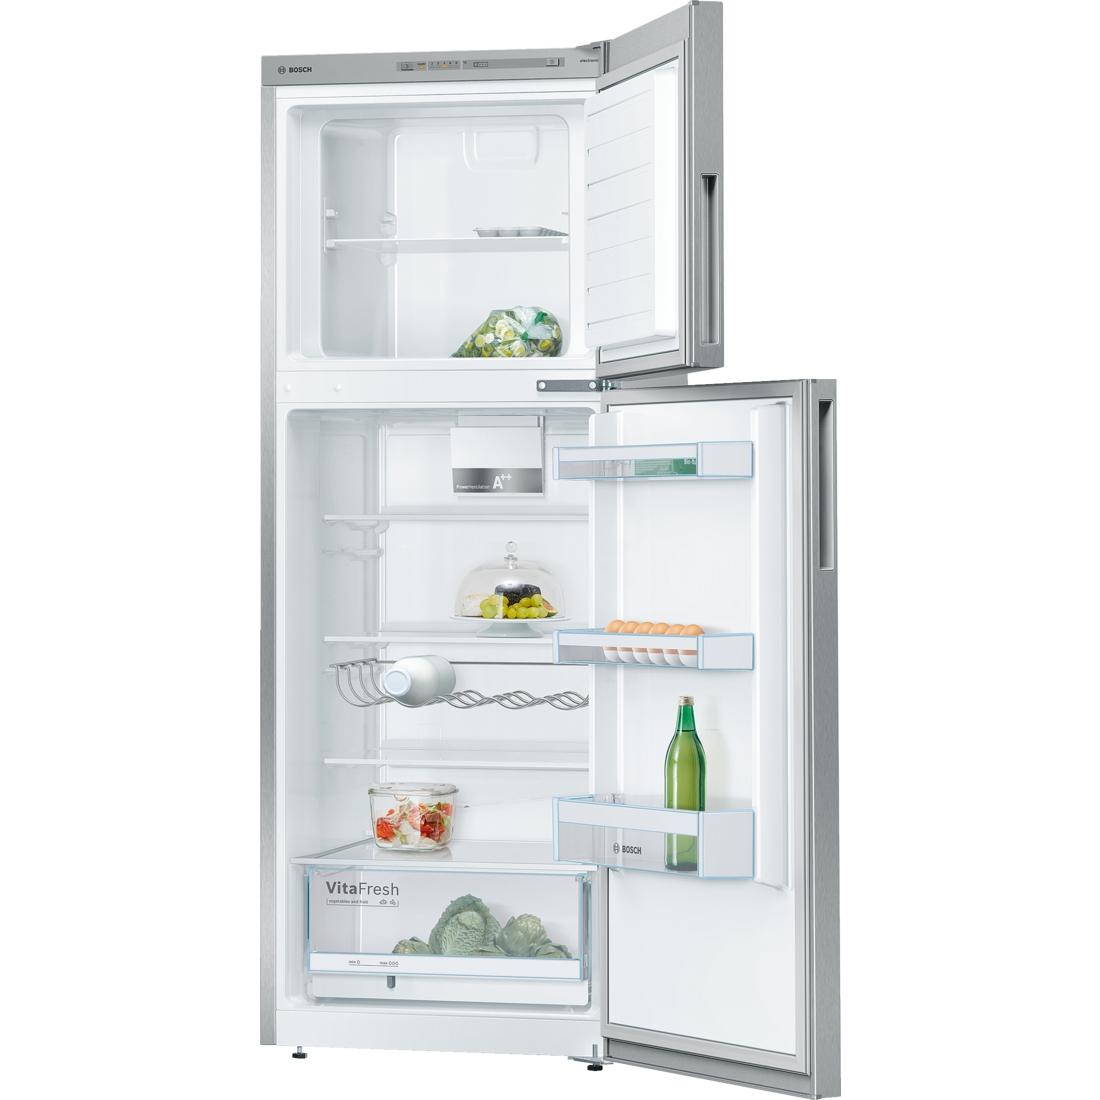 Bosch kdv29vl30 major household appliances appliances for Bosch online shop